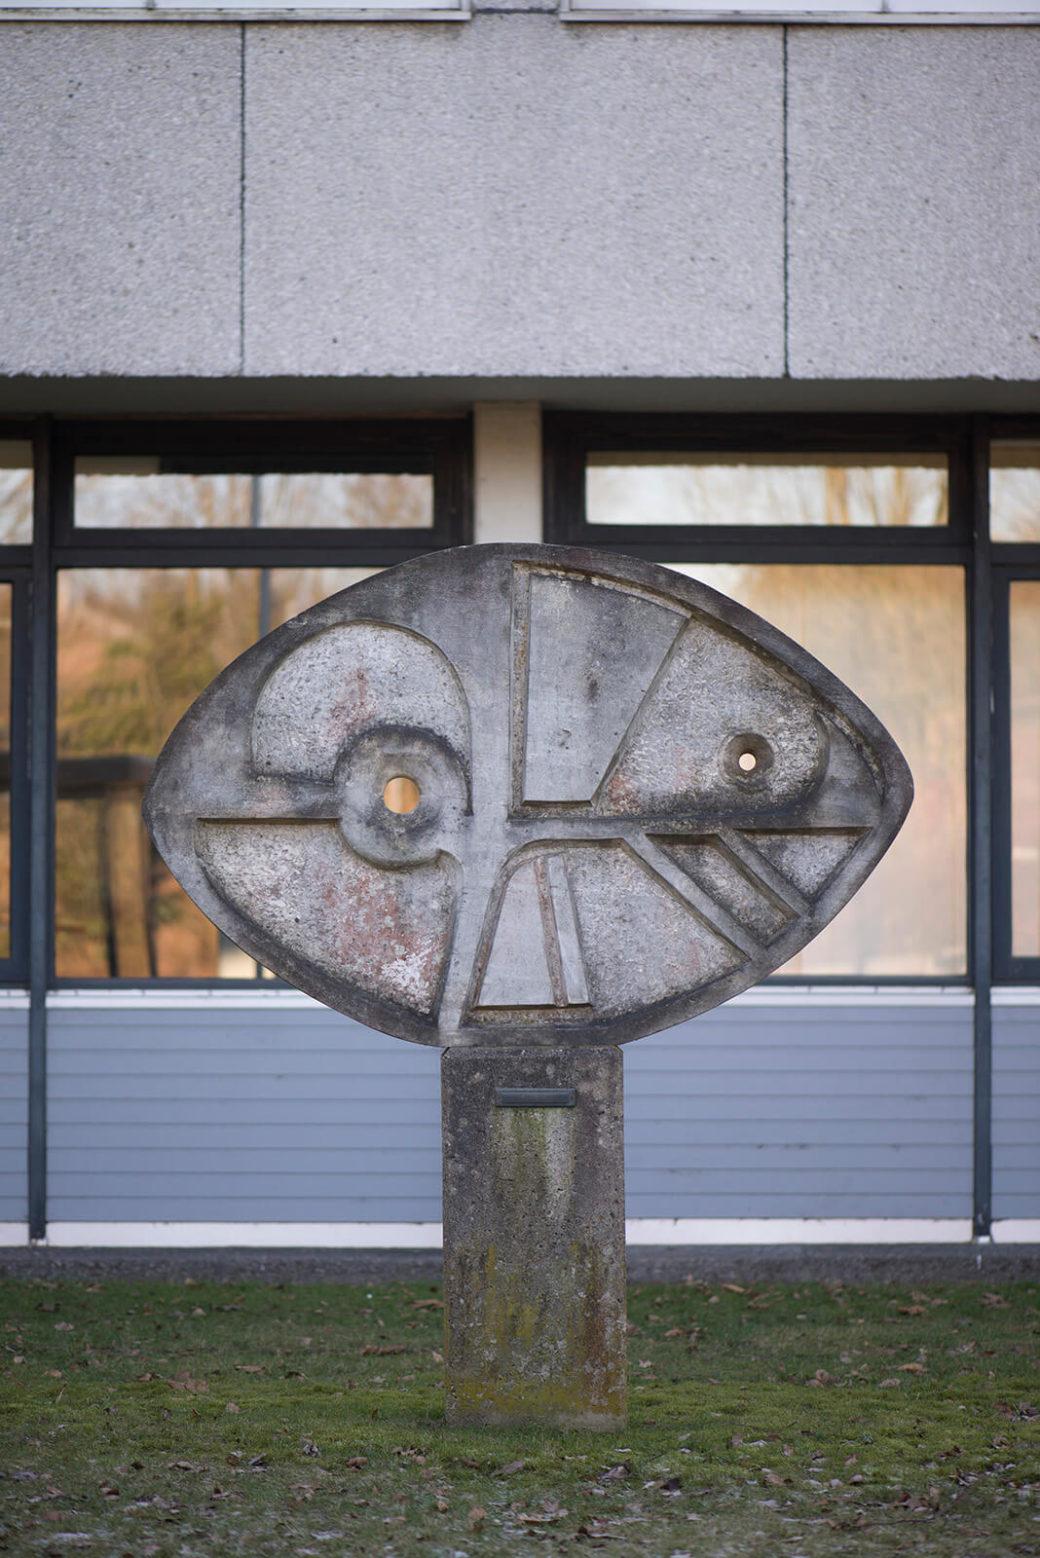 Pierre Schumann: Geometrisches Relief, (Foto: KUNST@SH/Jan Petersen, 2017)